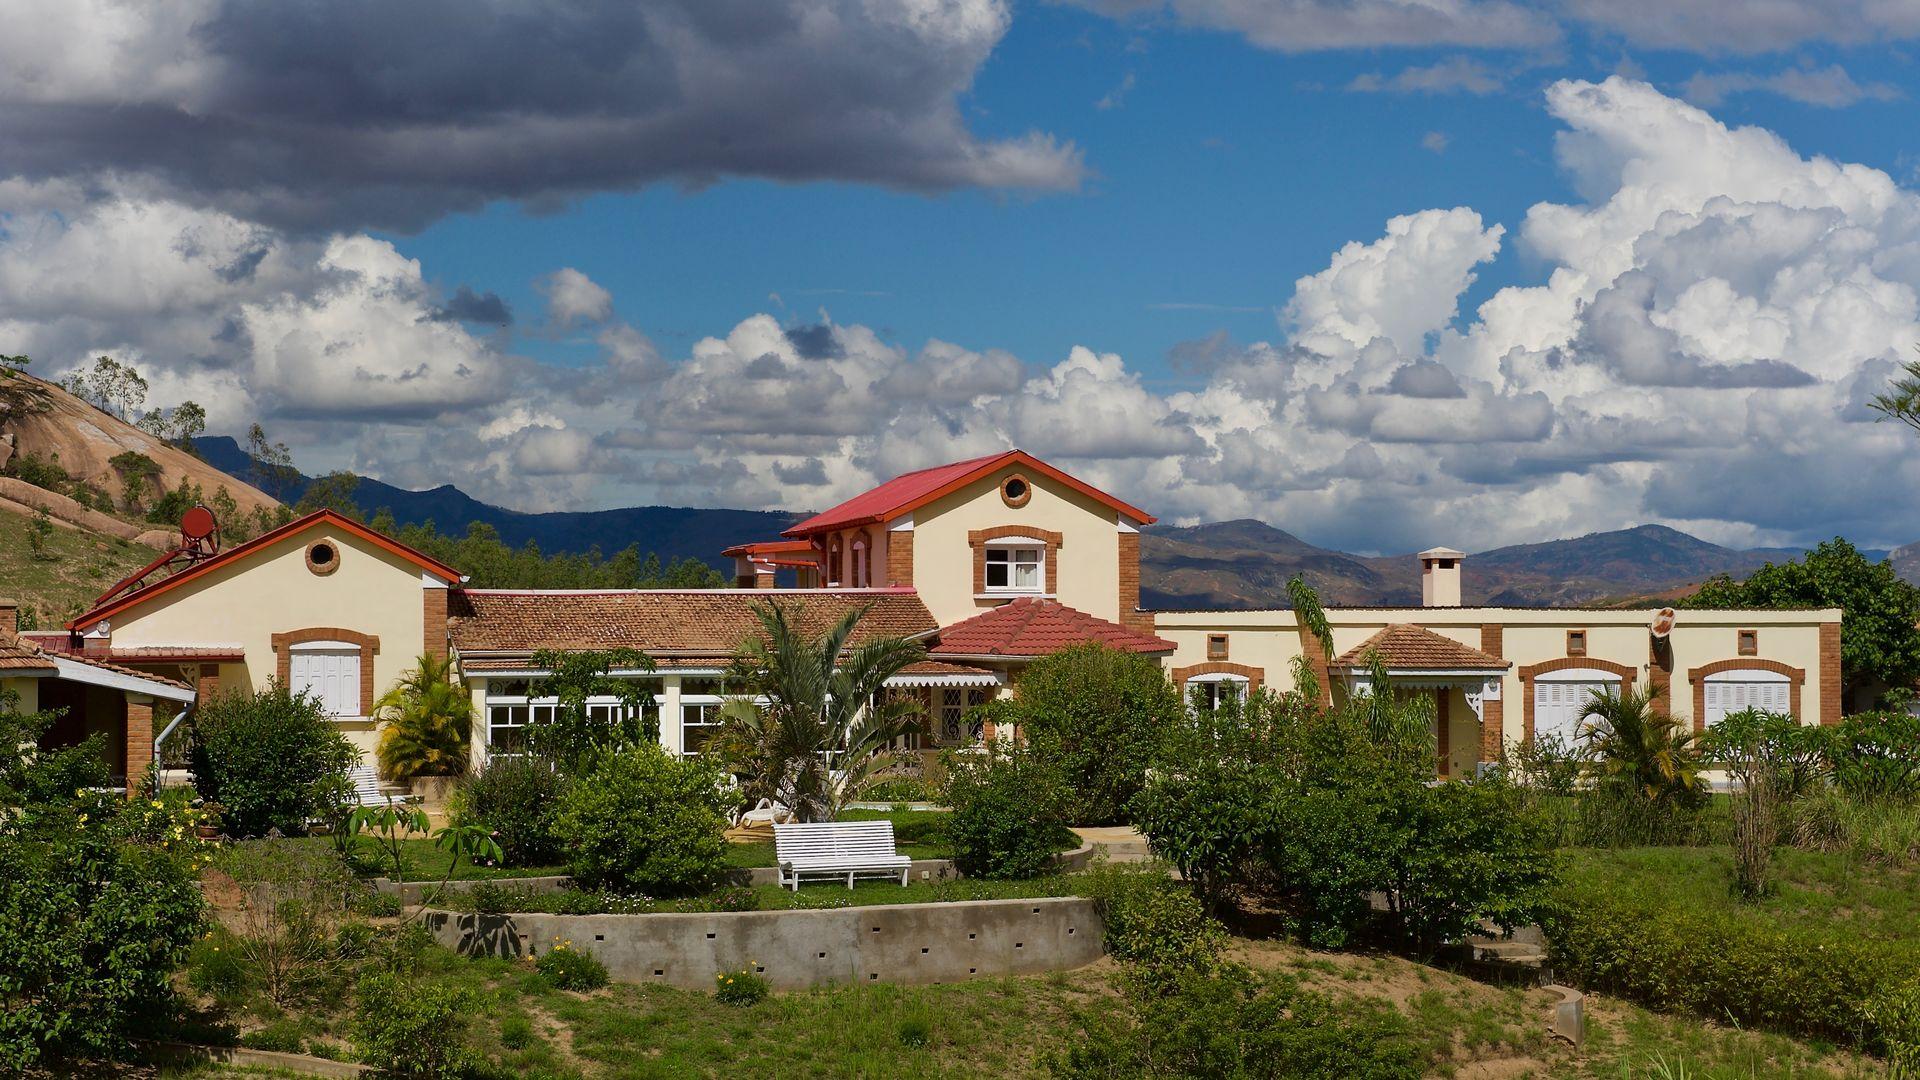 Betsileo Country Lodge - De lodge van Matoke Tours in Madagascar